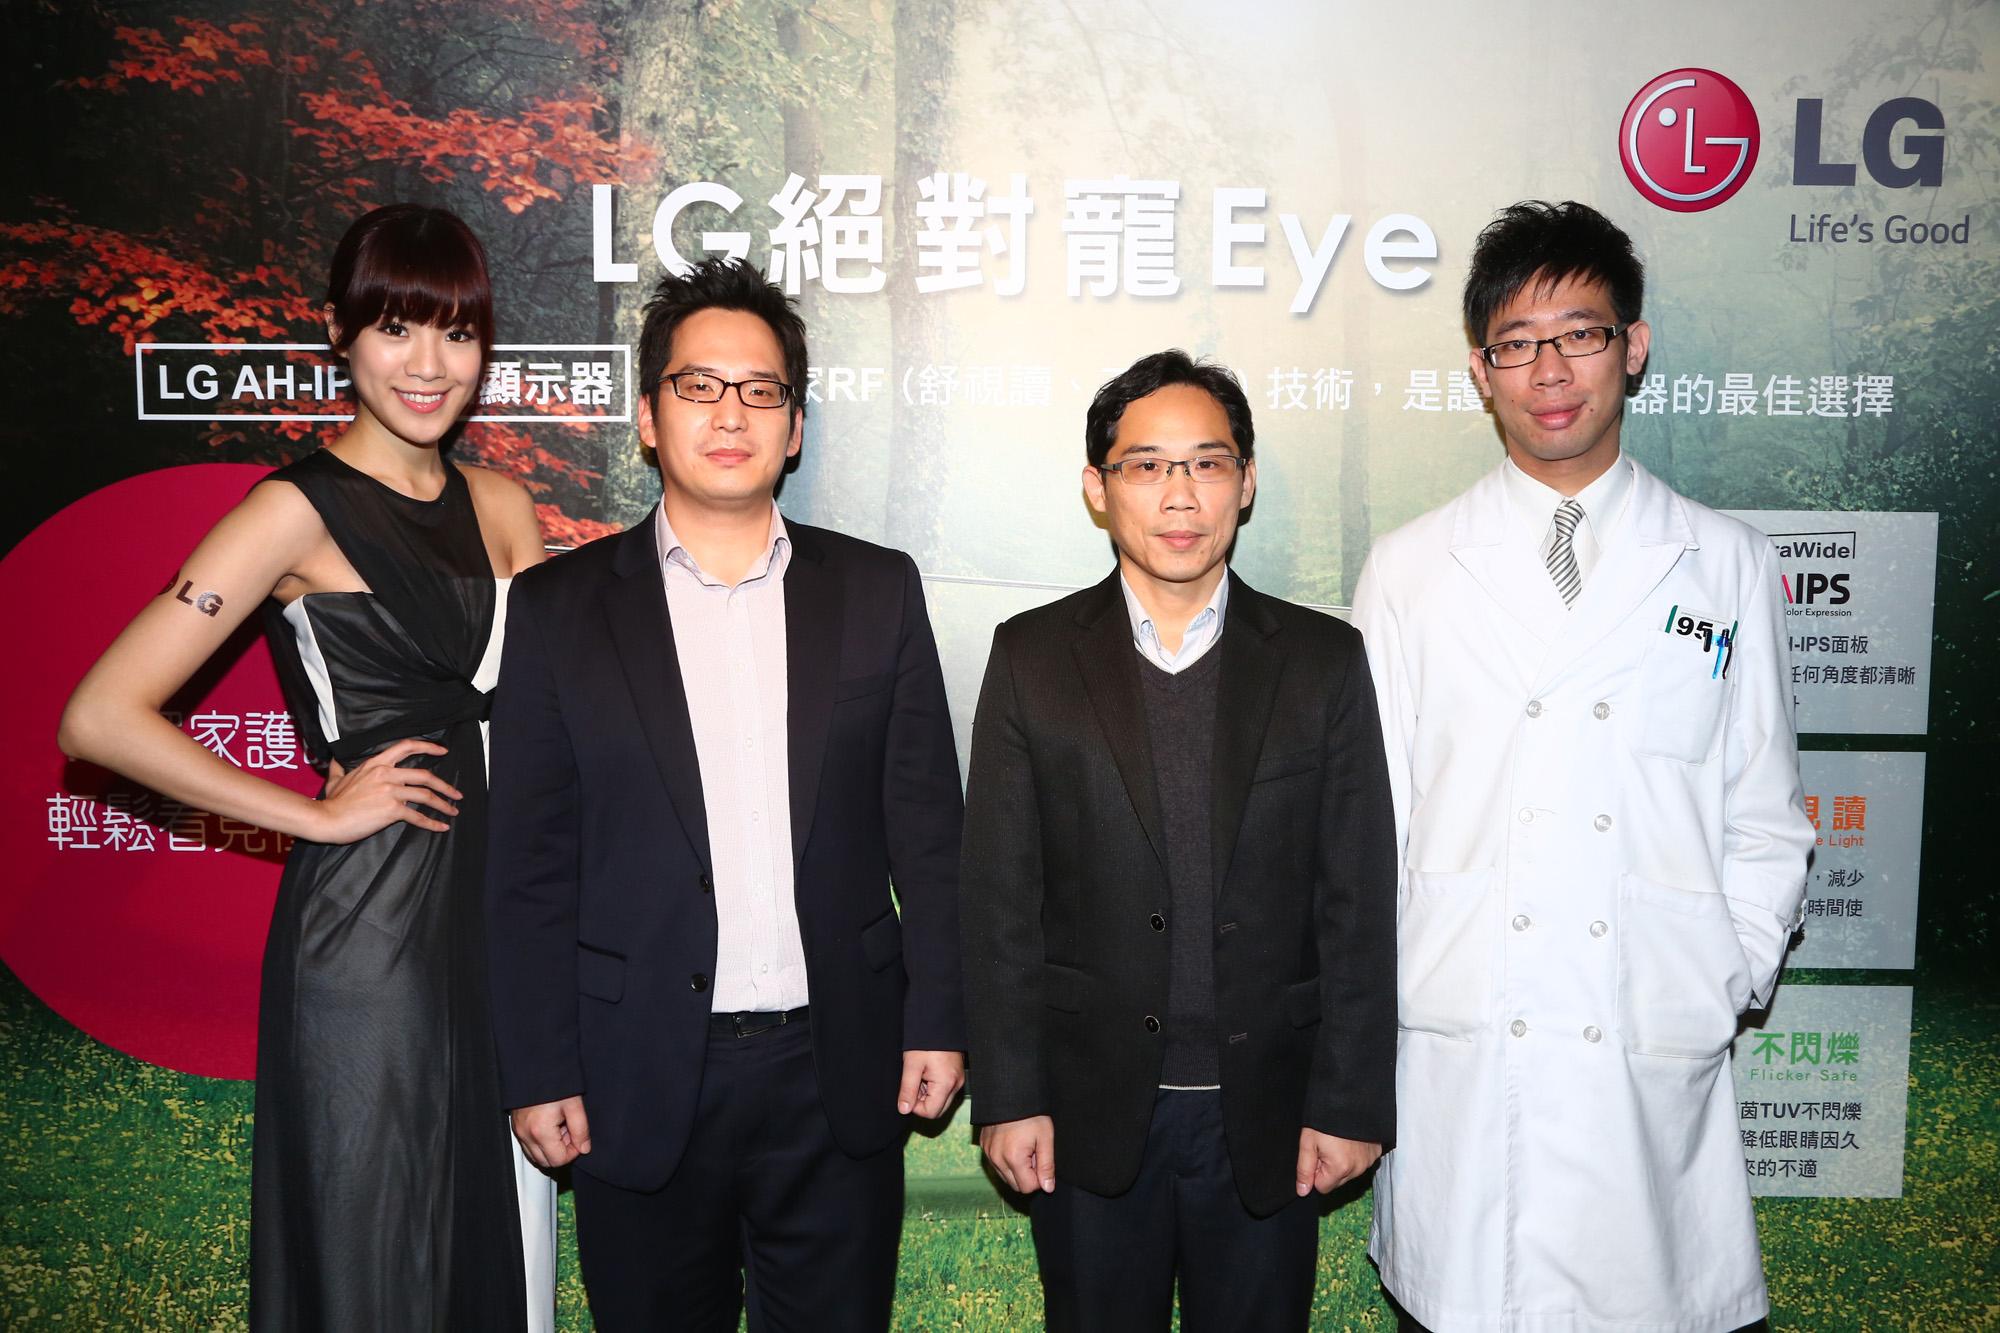 LG推2014全新AH-IPS系列液晶顯示器